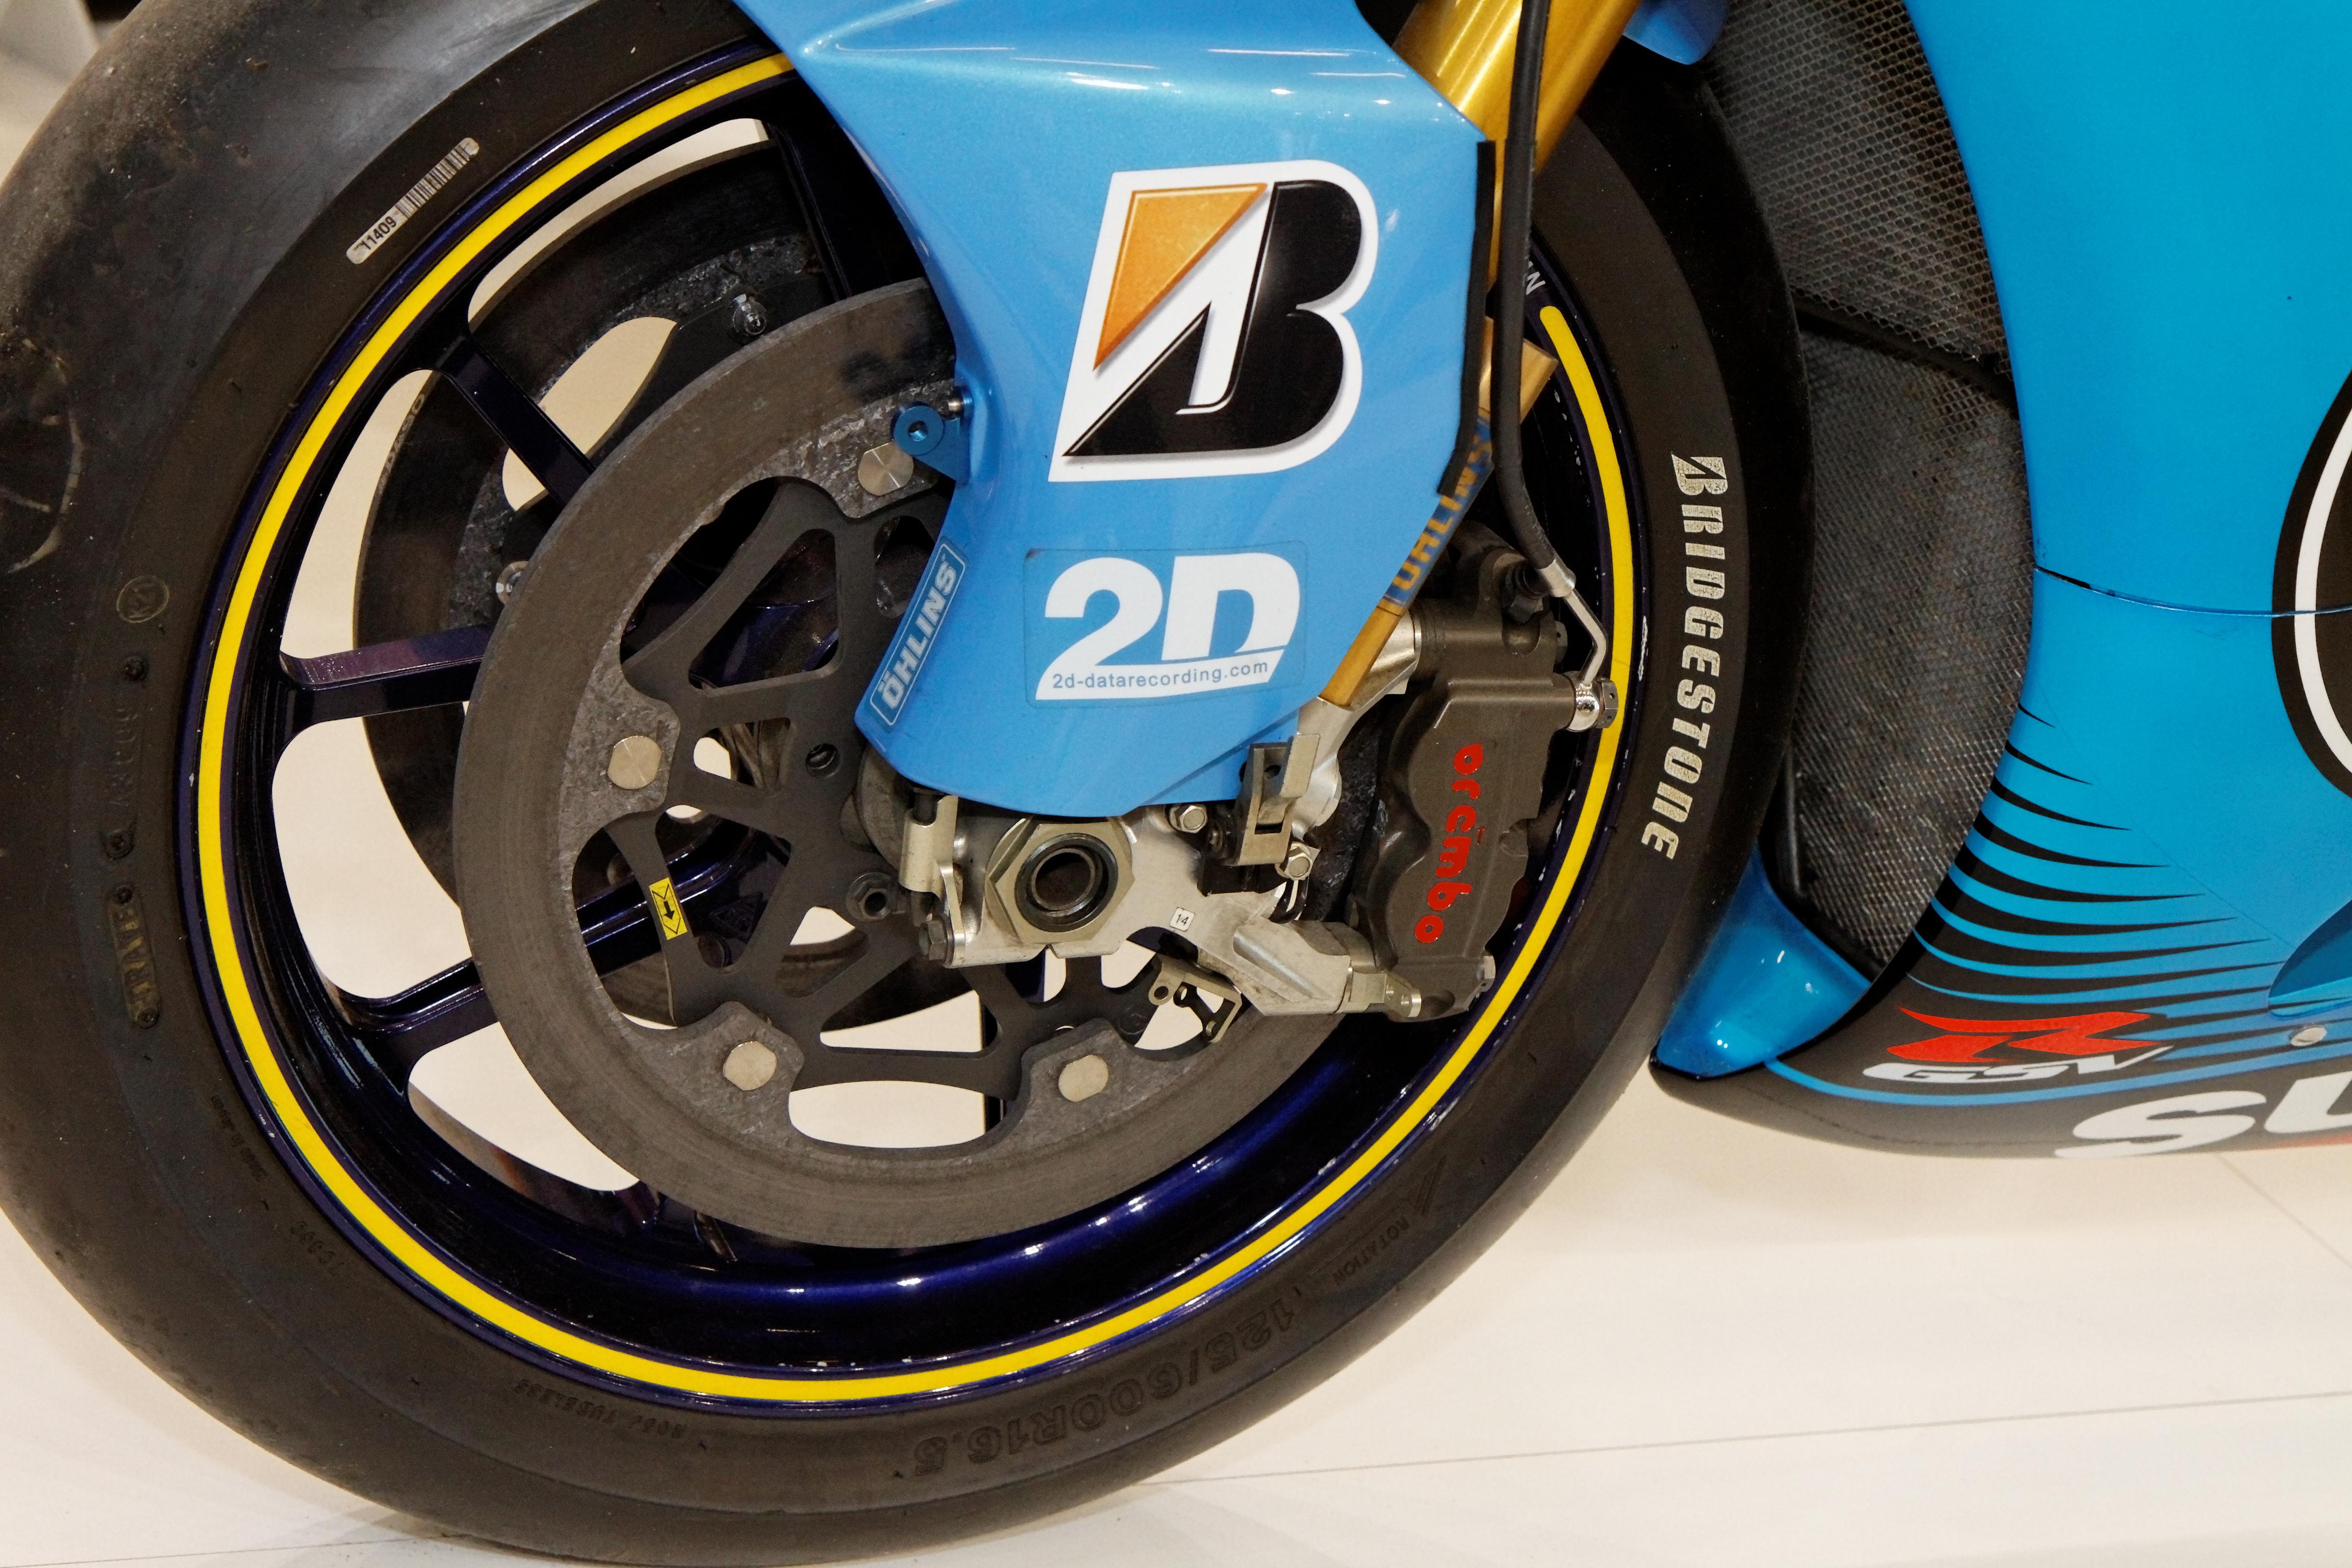 motogp 2011 wiki Photo